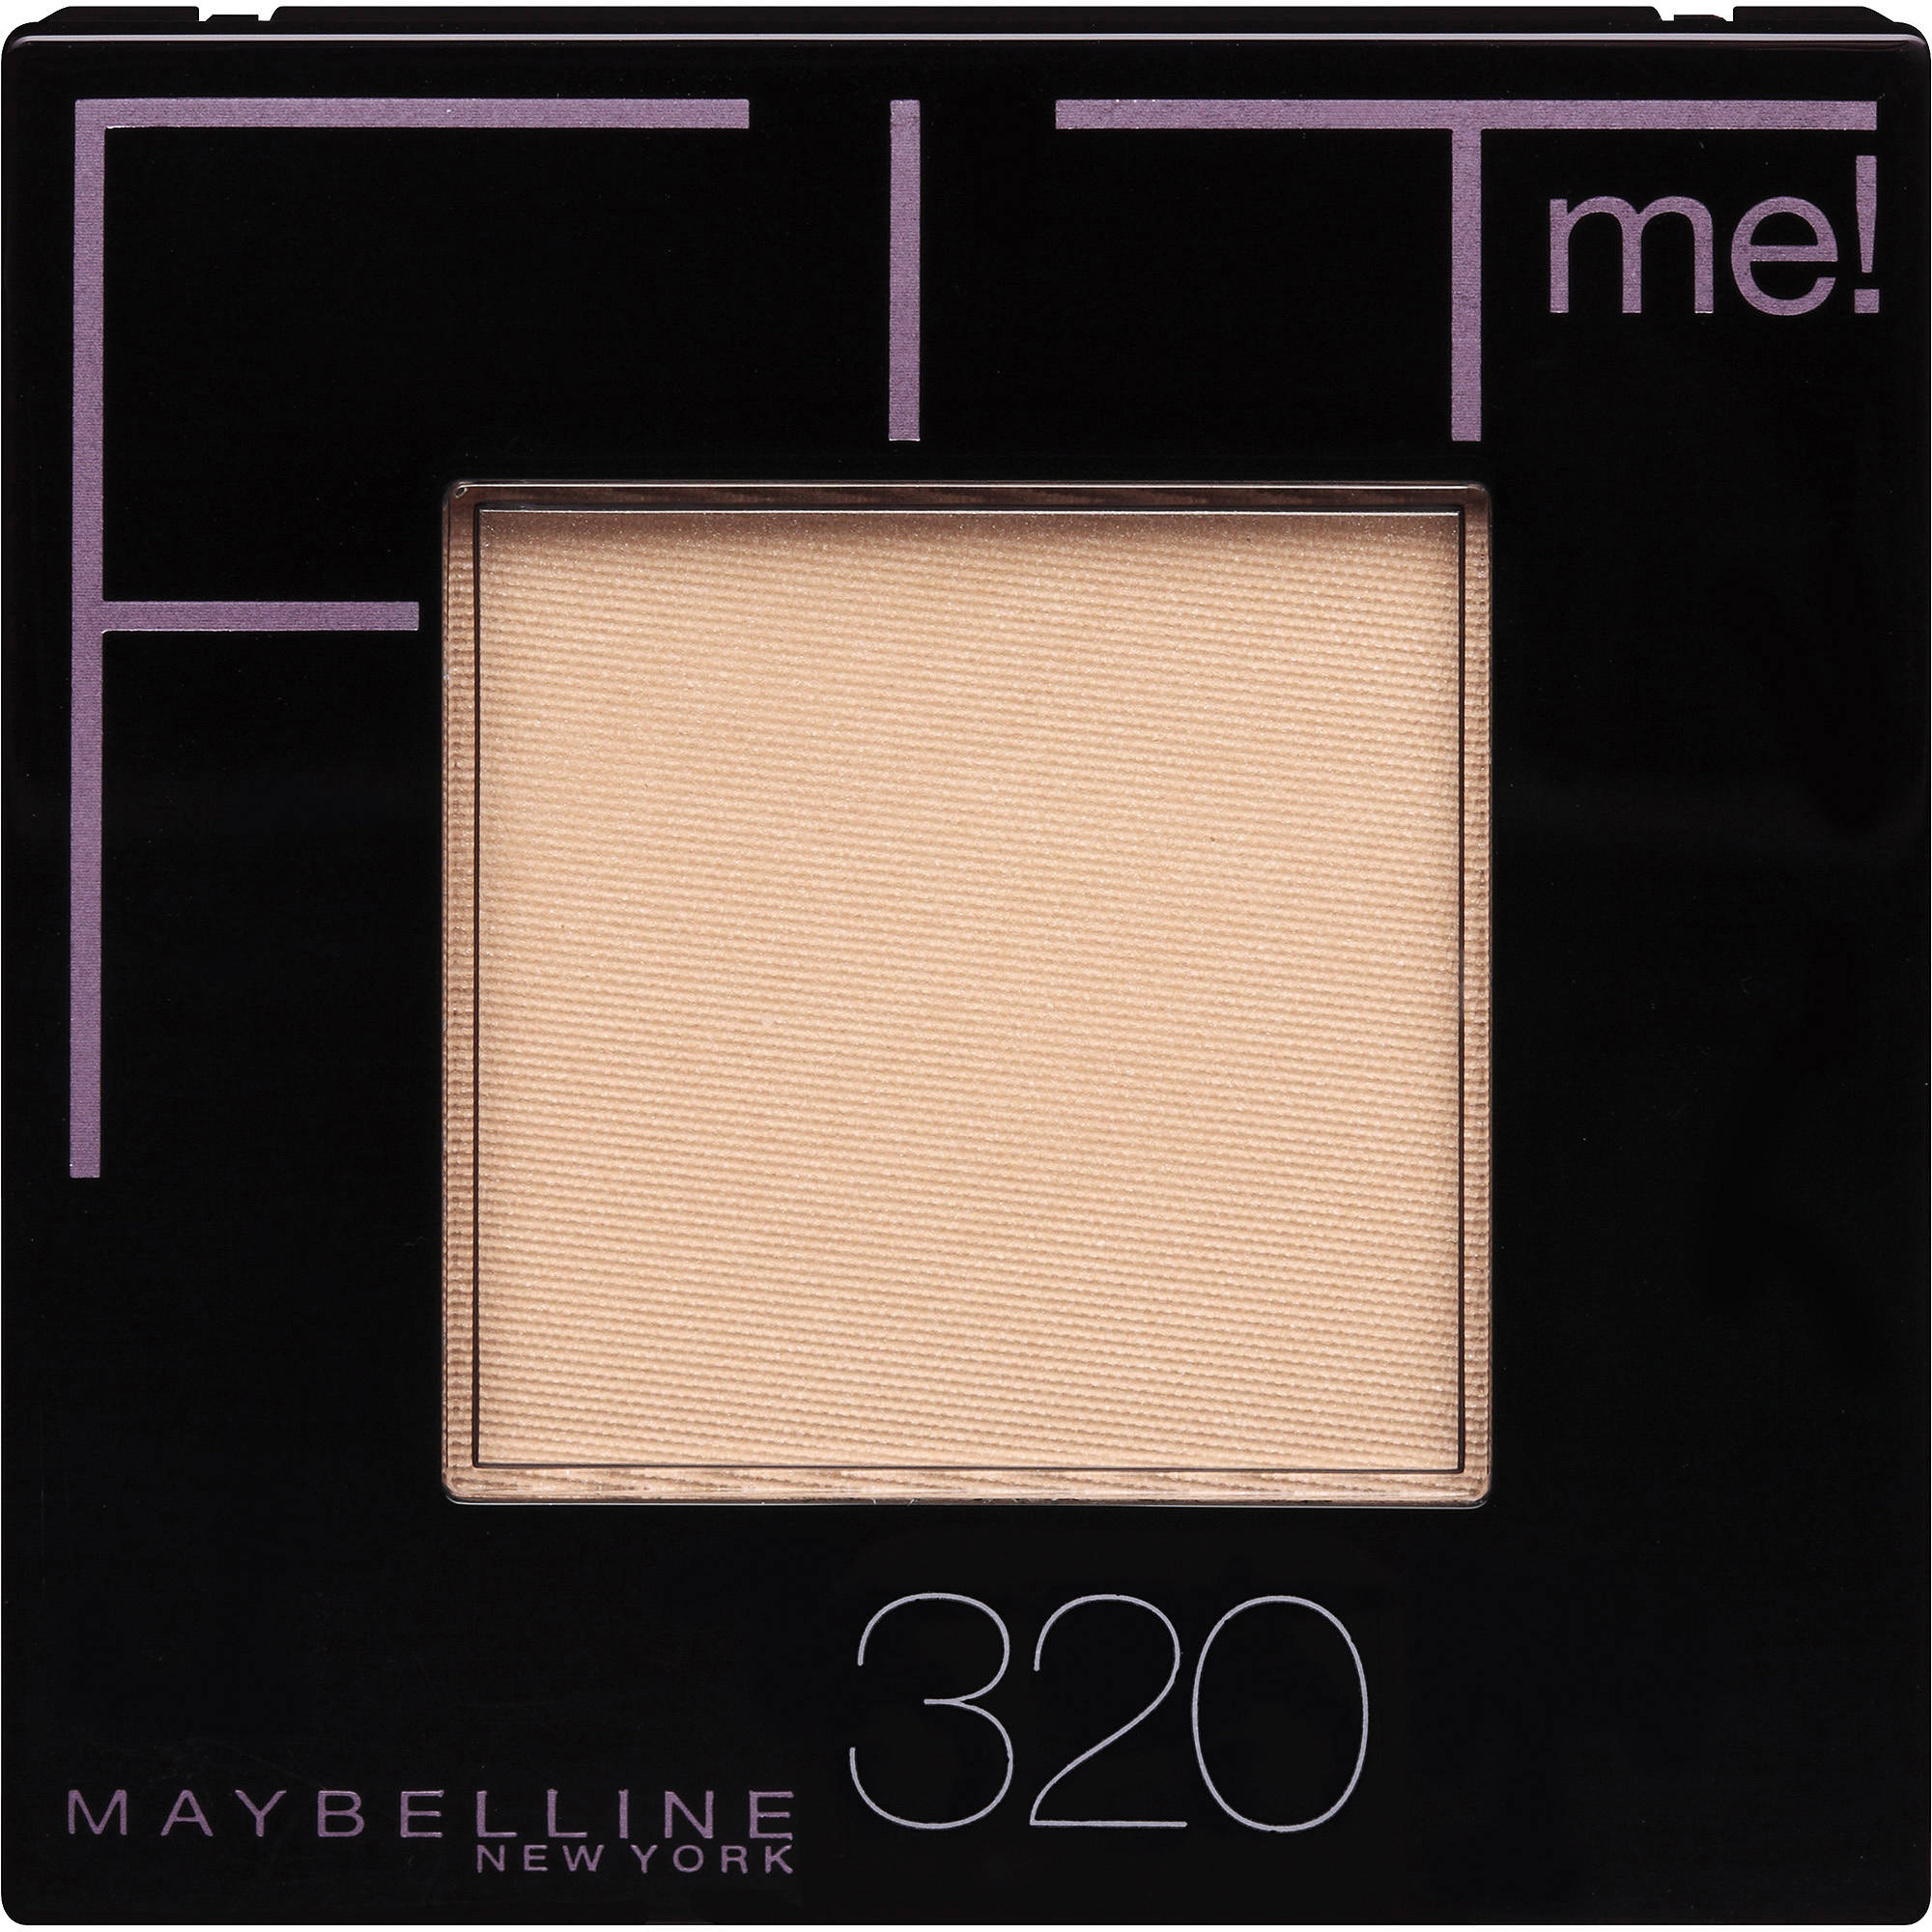 Maybelline New York Fit Me Powder, Honey Beige 320